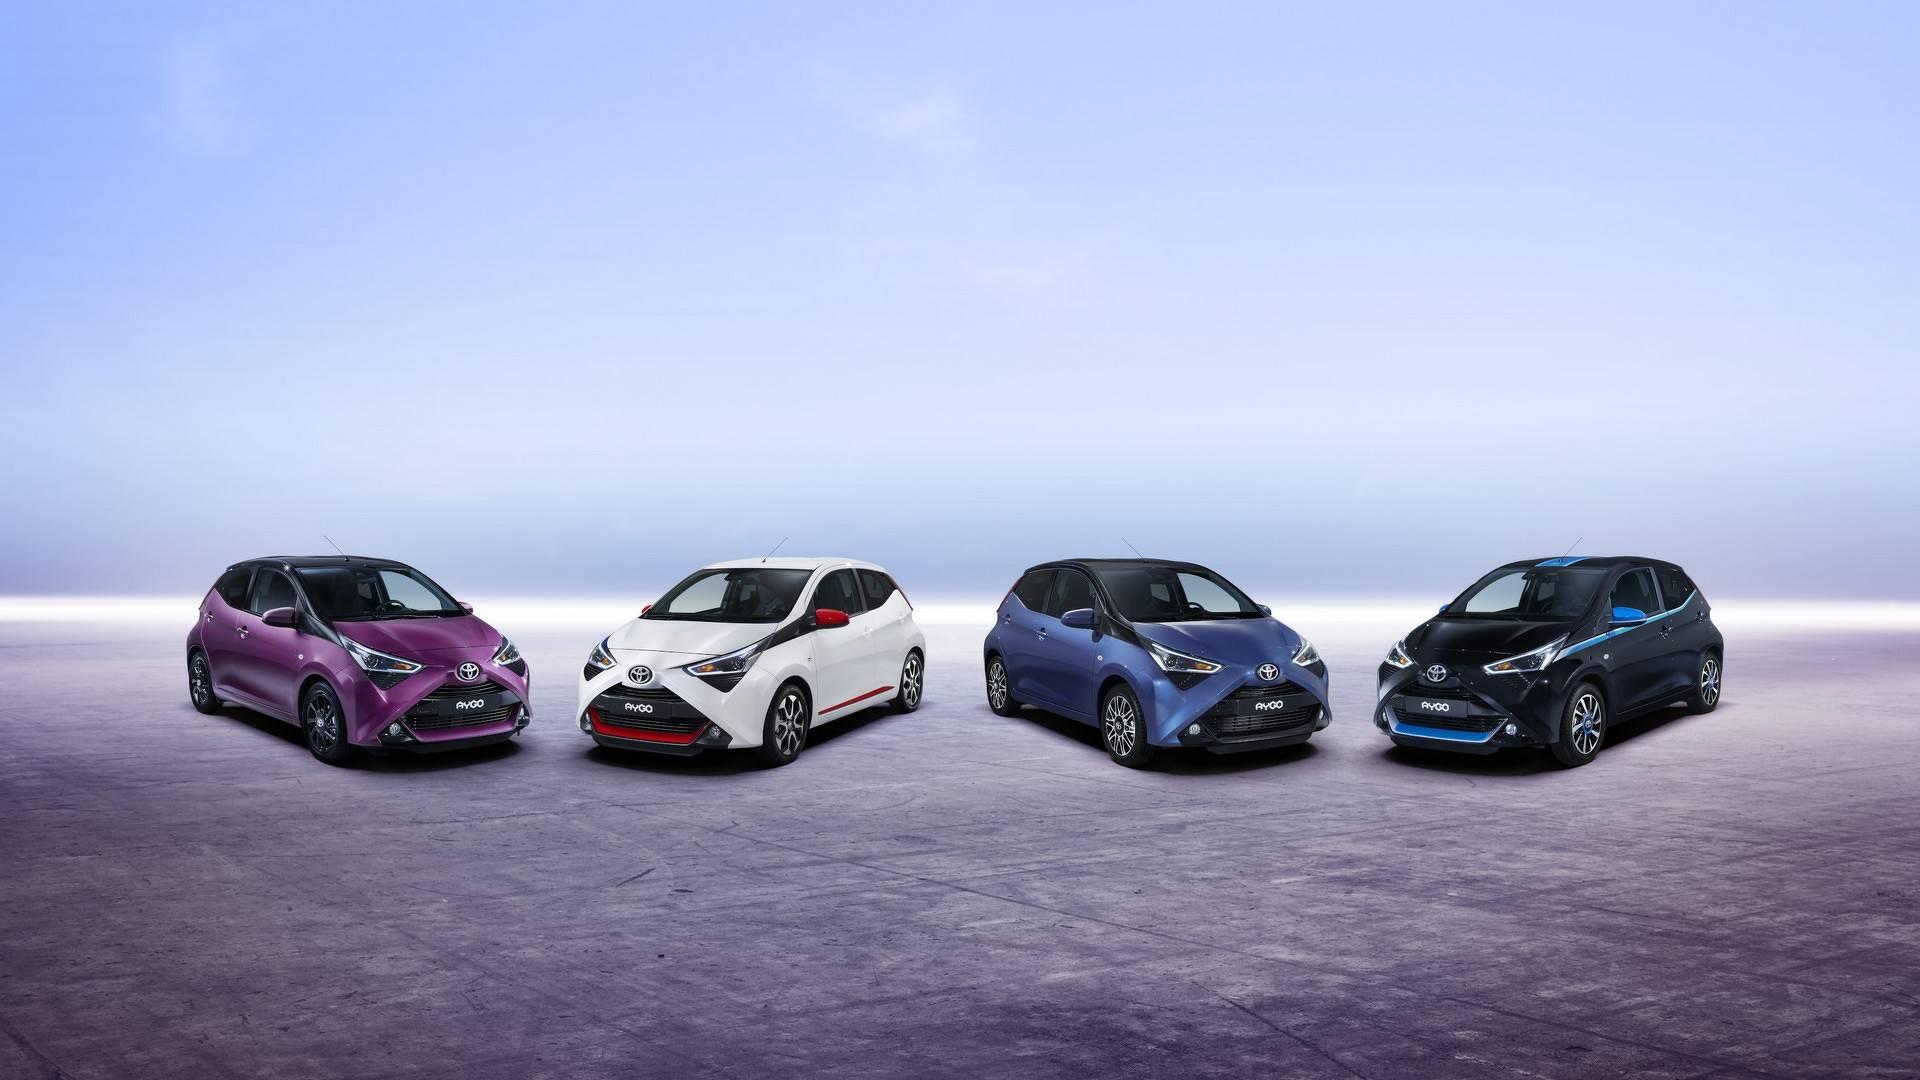 2018 Toyota Aygo Facelift Previews Ahead of Geneva 5